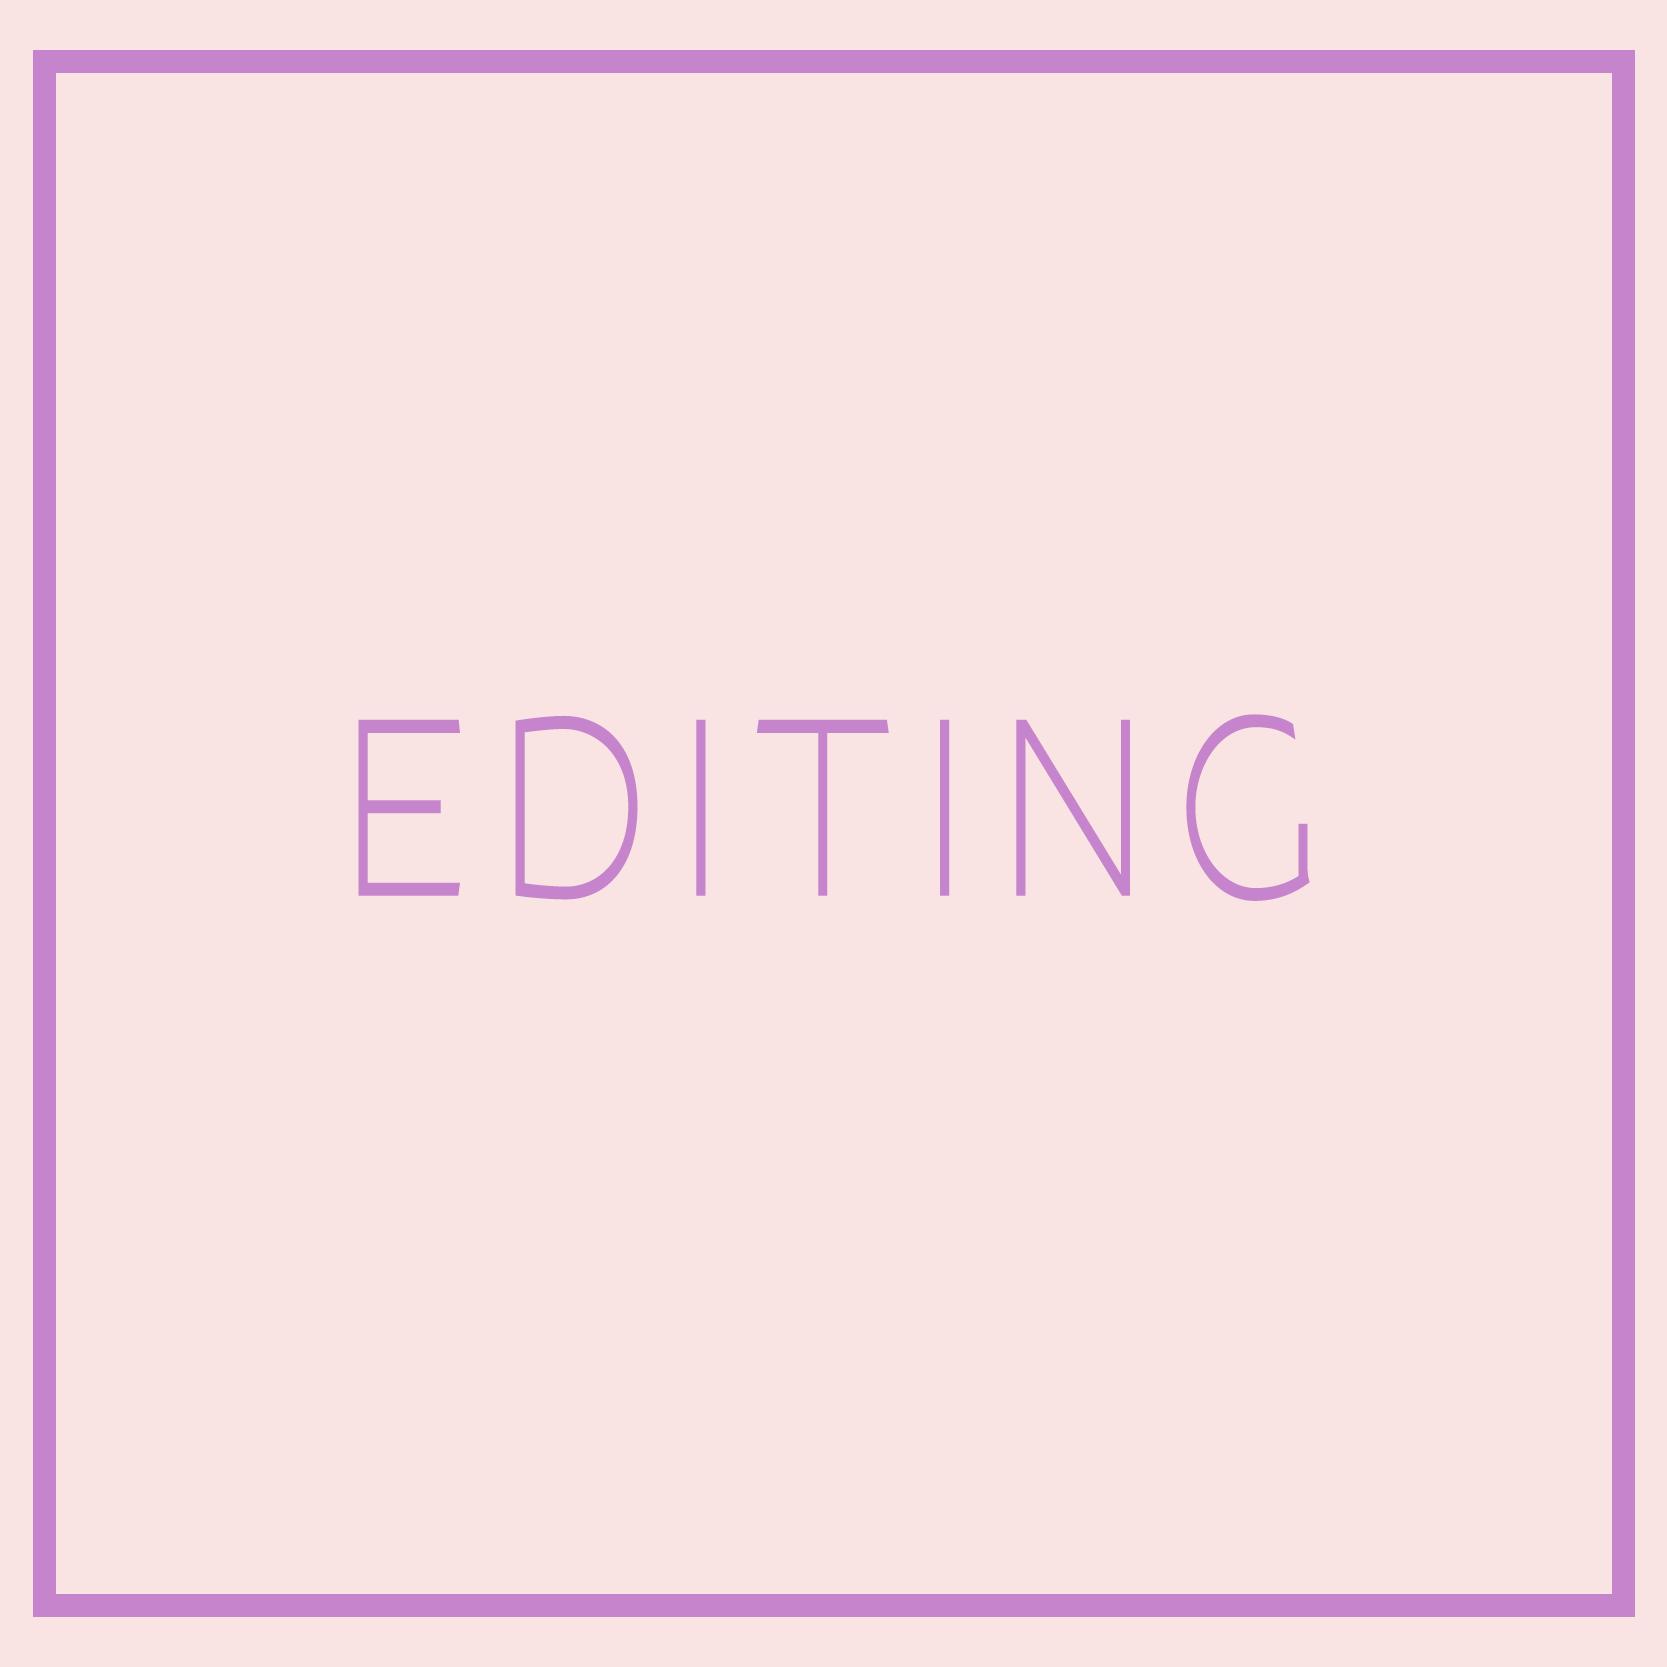 Editing_WhereToStartButton_Template.png